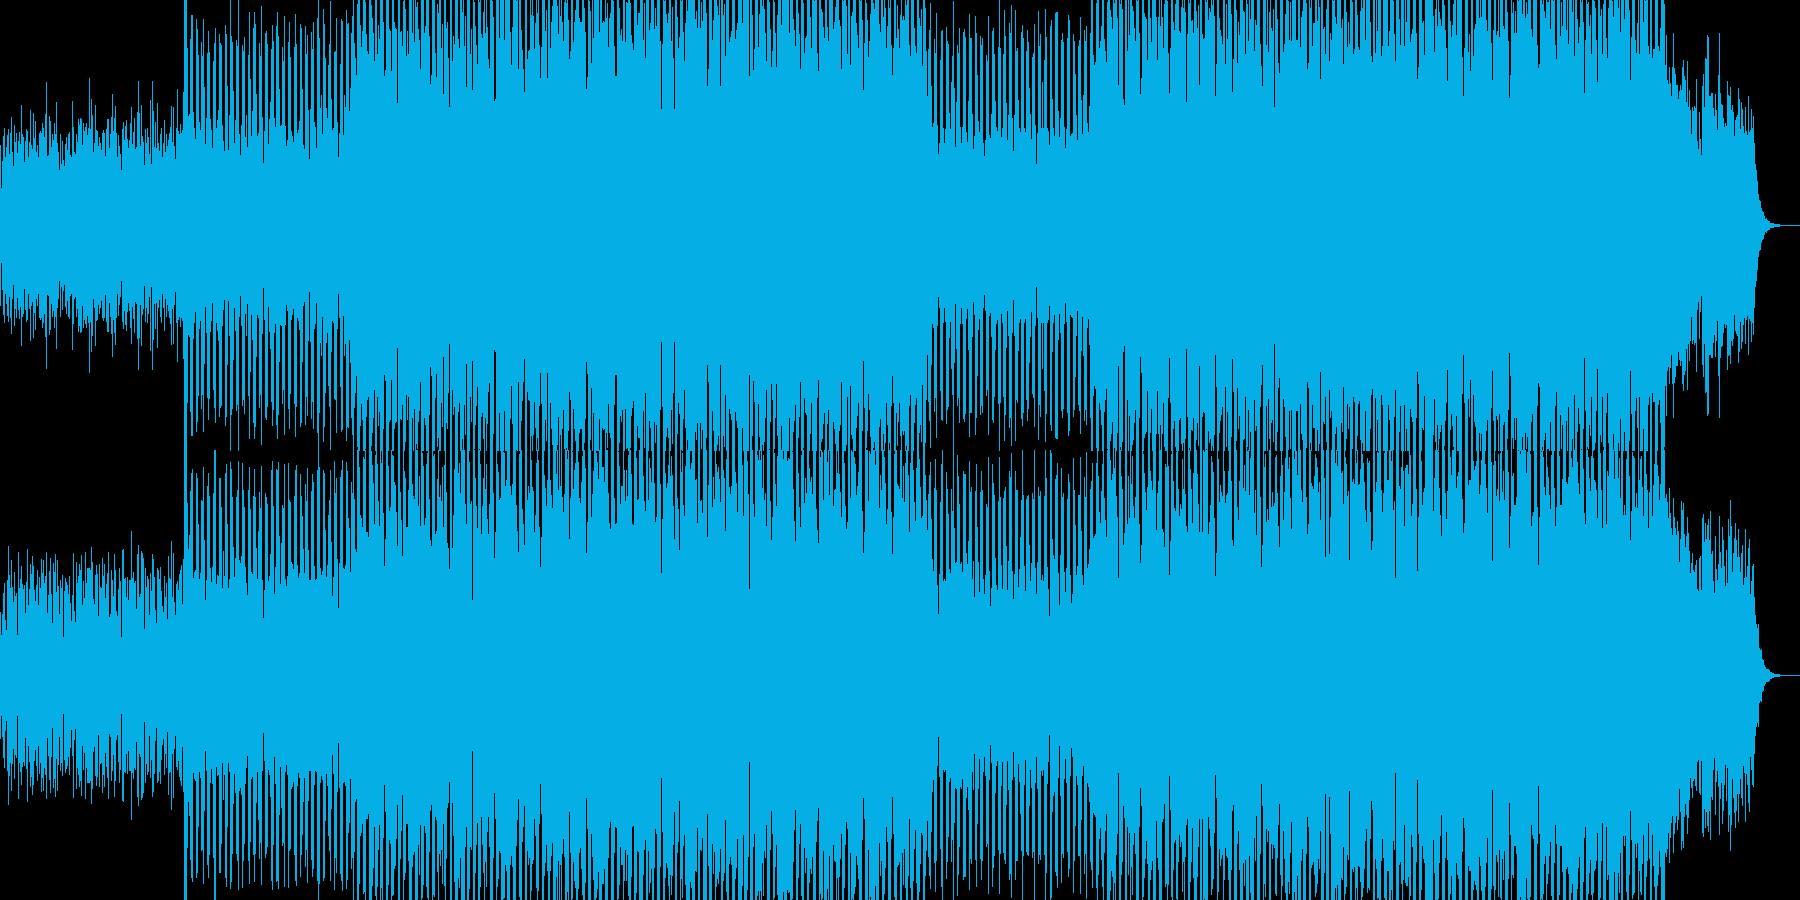 EDMポップで明るいクラブ系-73の再生済みの波形